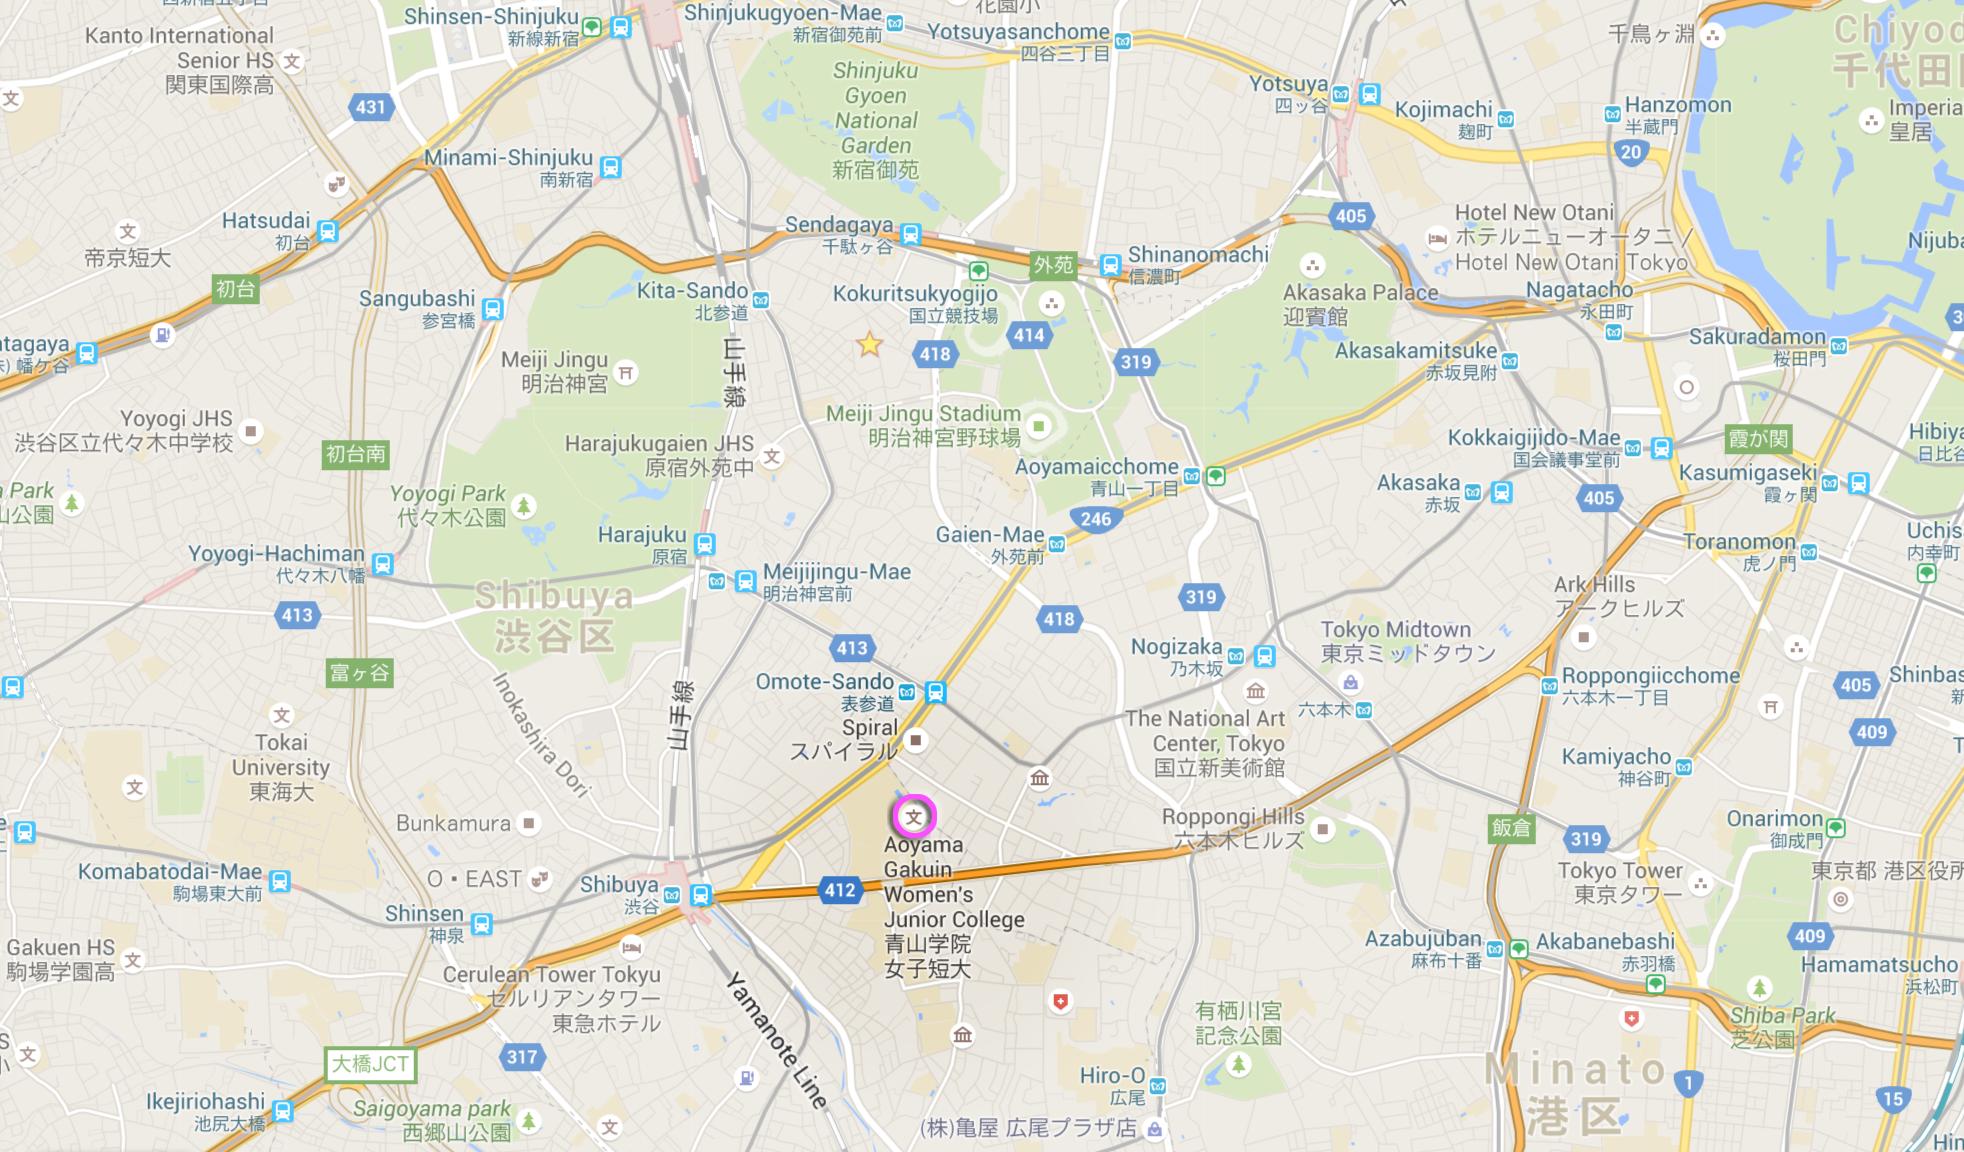 Shibuya Map